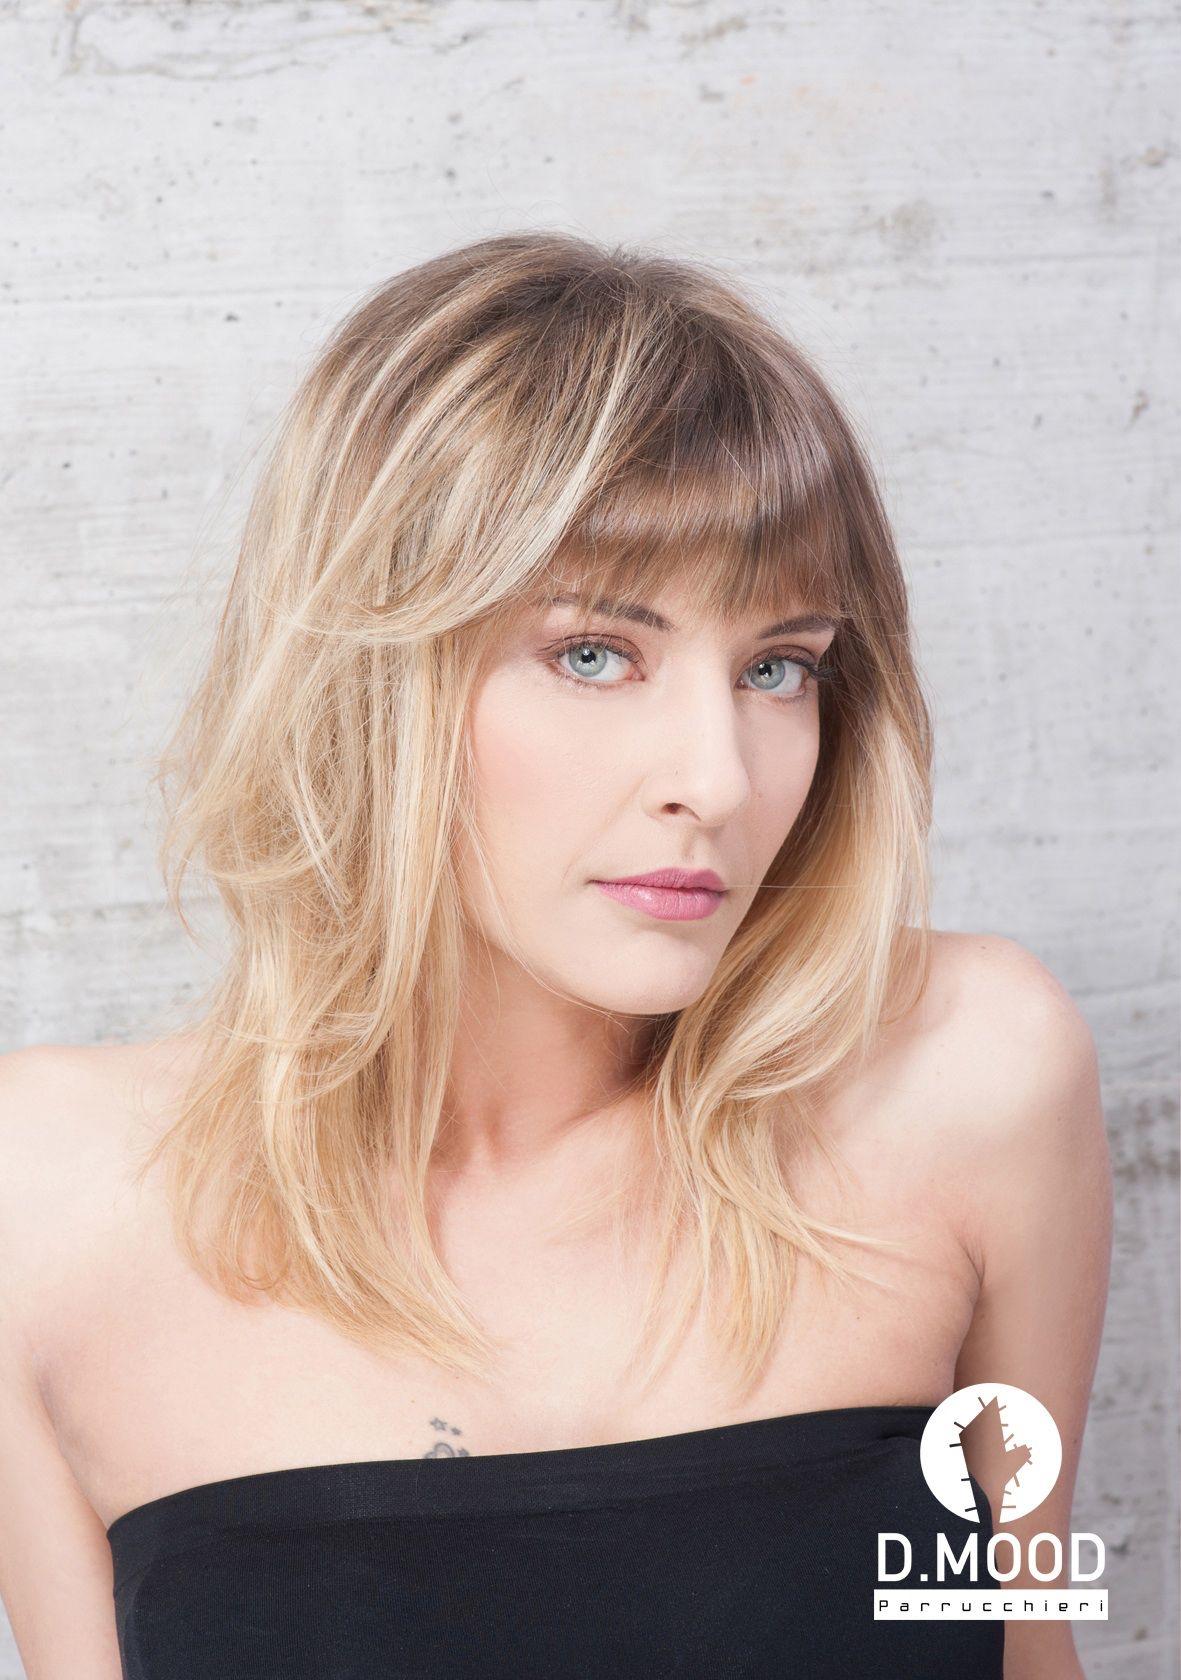 Essential P/E 16   Nuova collezione #dmood #longhair #hair #blonde #cuthair #fashion #love #loveit #lovehair #dmoodneverstops